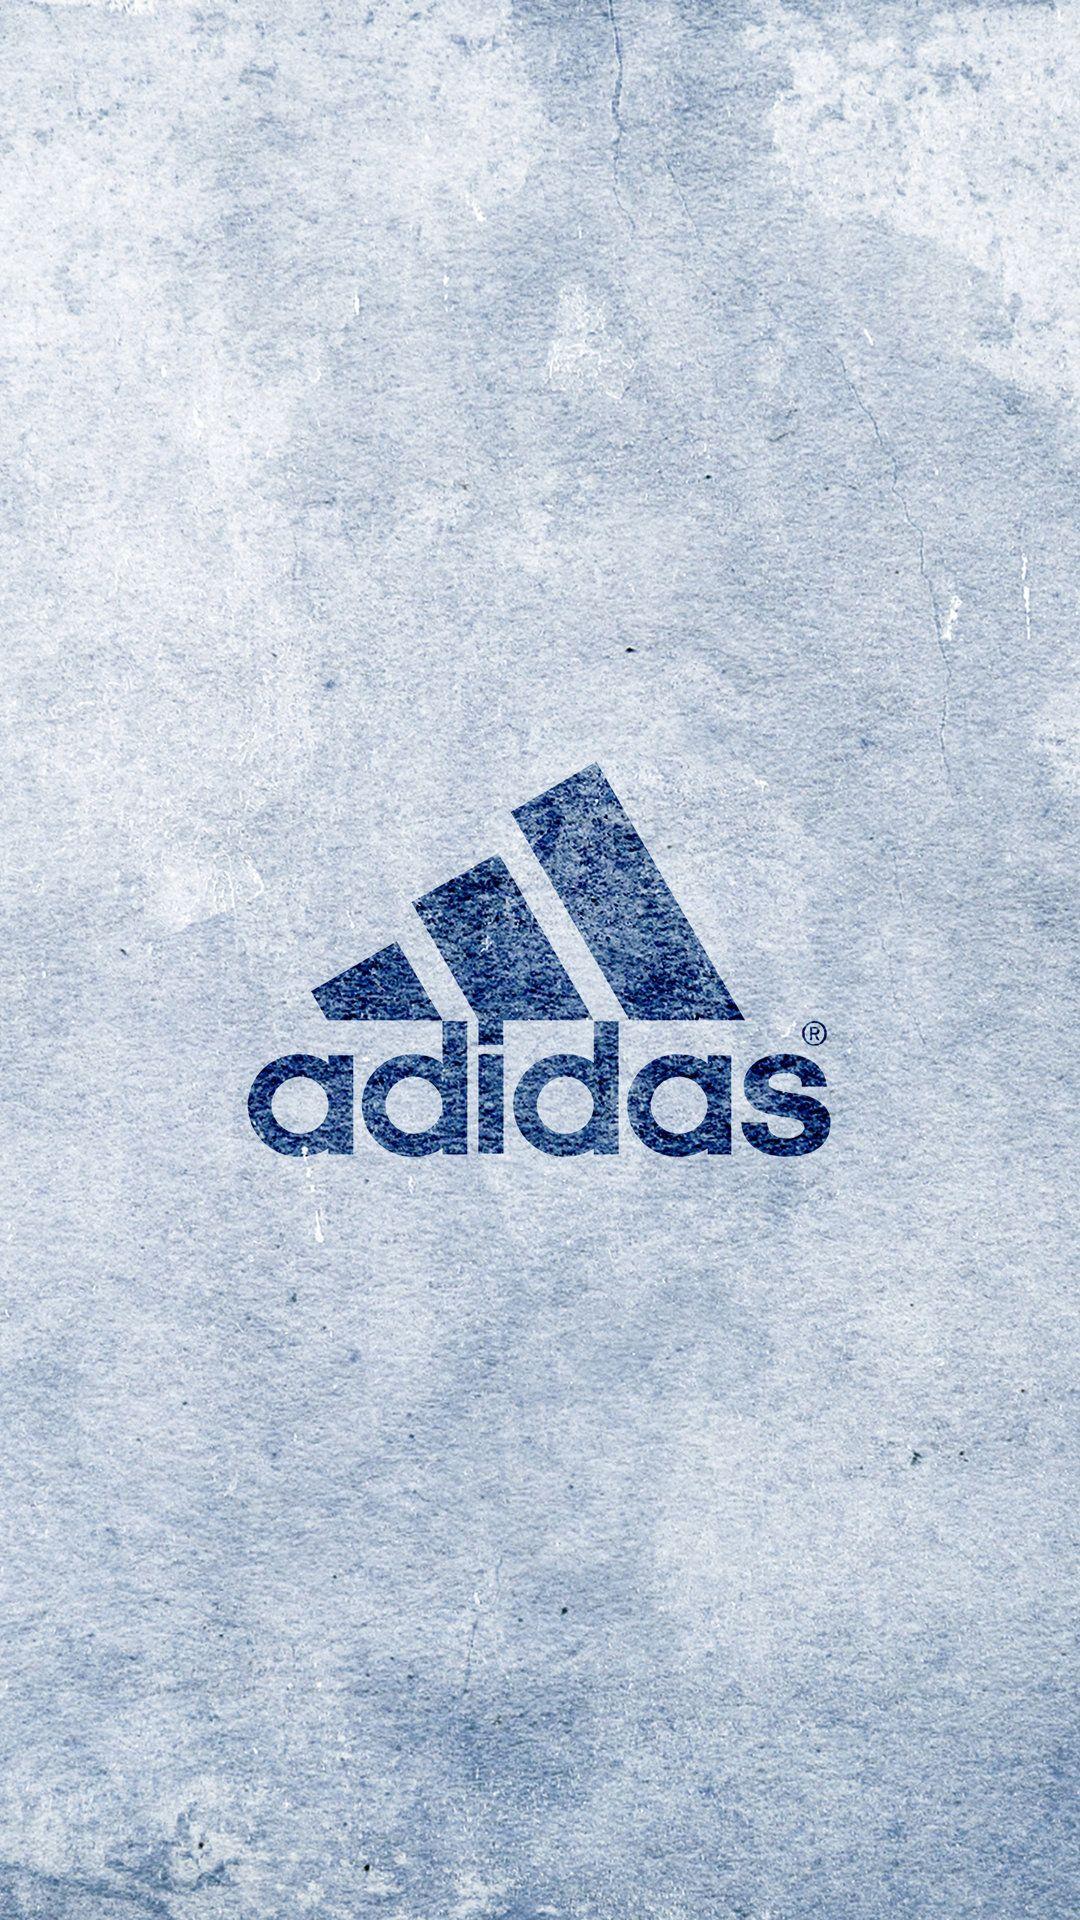 Adidas Adidas Iphone Wallpaper Adidas Wallpaper Iphone Adidas Wallpaper Backgrounds